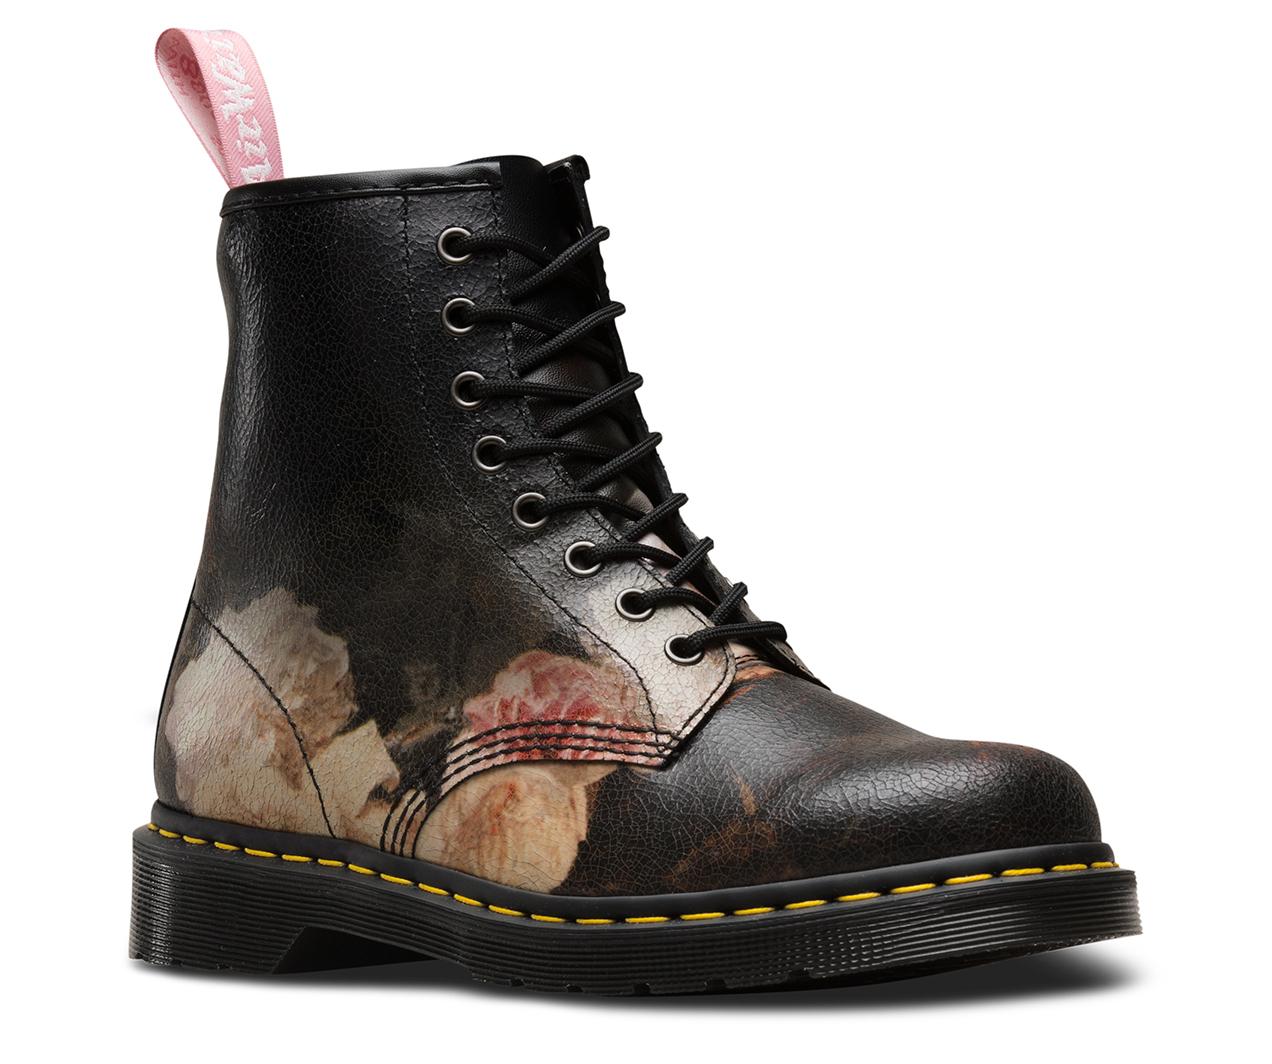 1460 power corruption lies women 39 s boots shoes official dr martens store. Black Bedroom Furniture Sets. Home Design Ideas